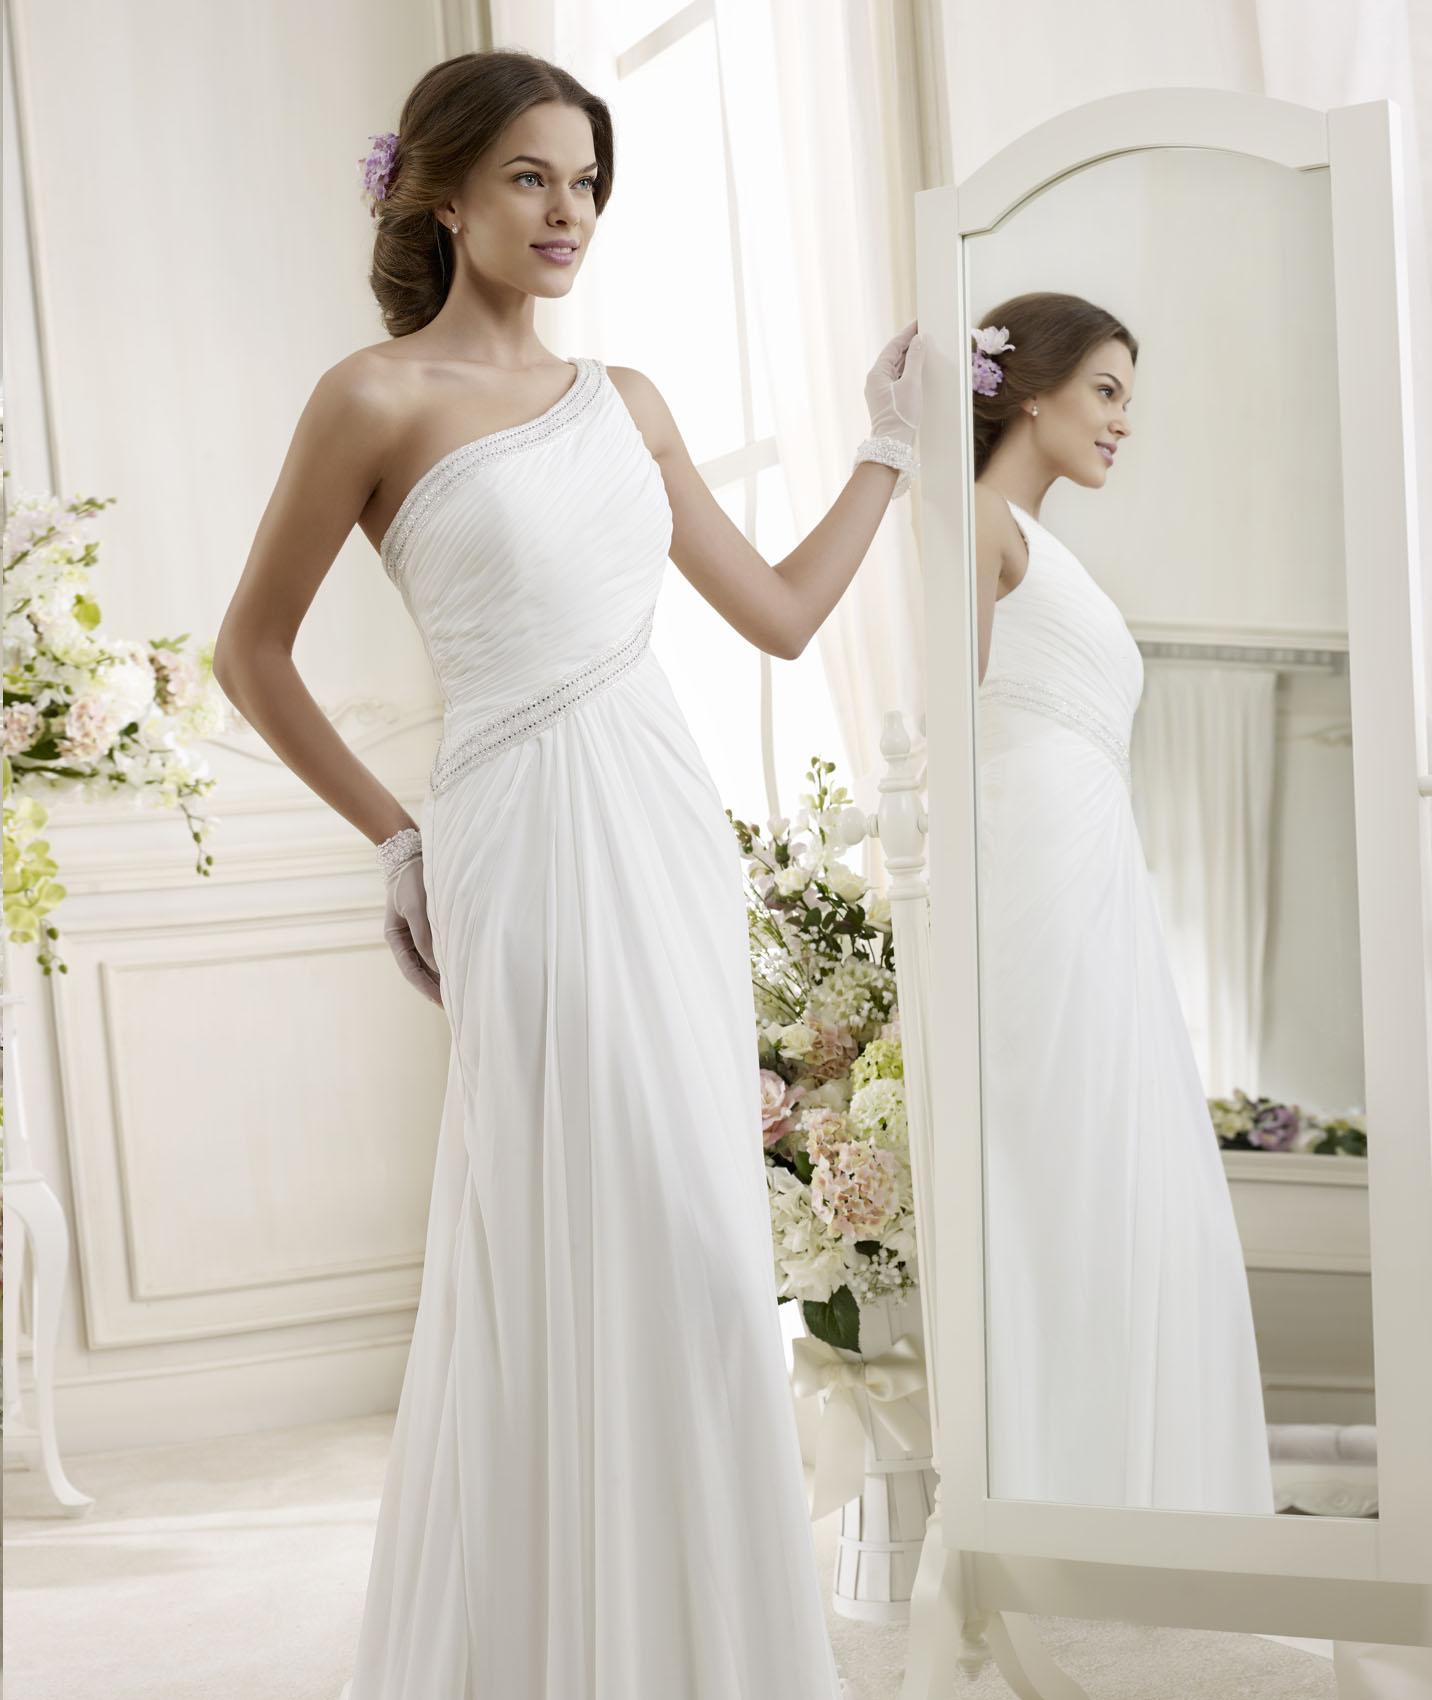 Colet Spose 2014 Bridal Collection (VI)